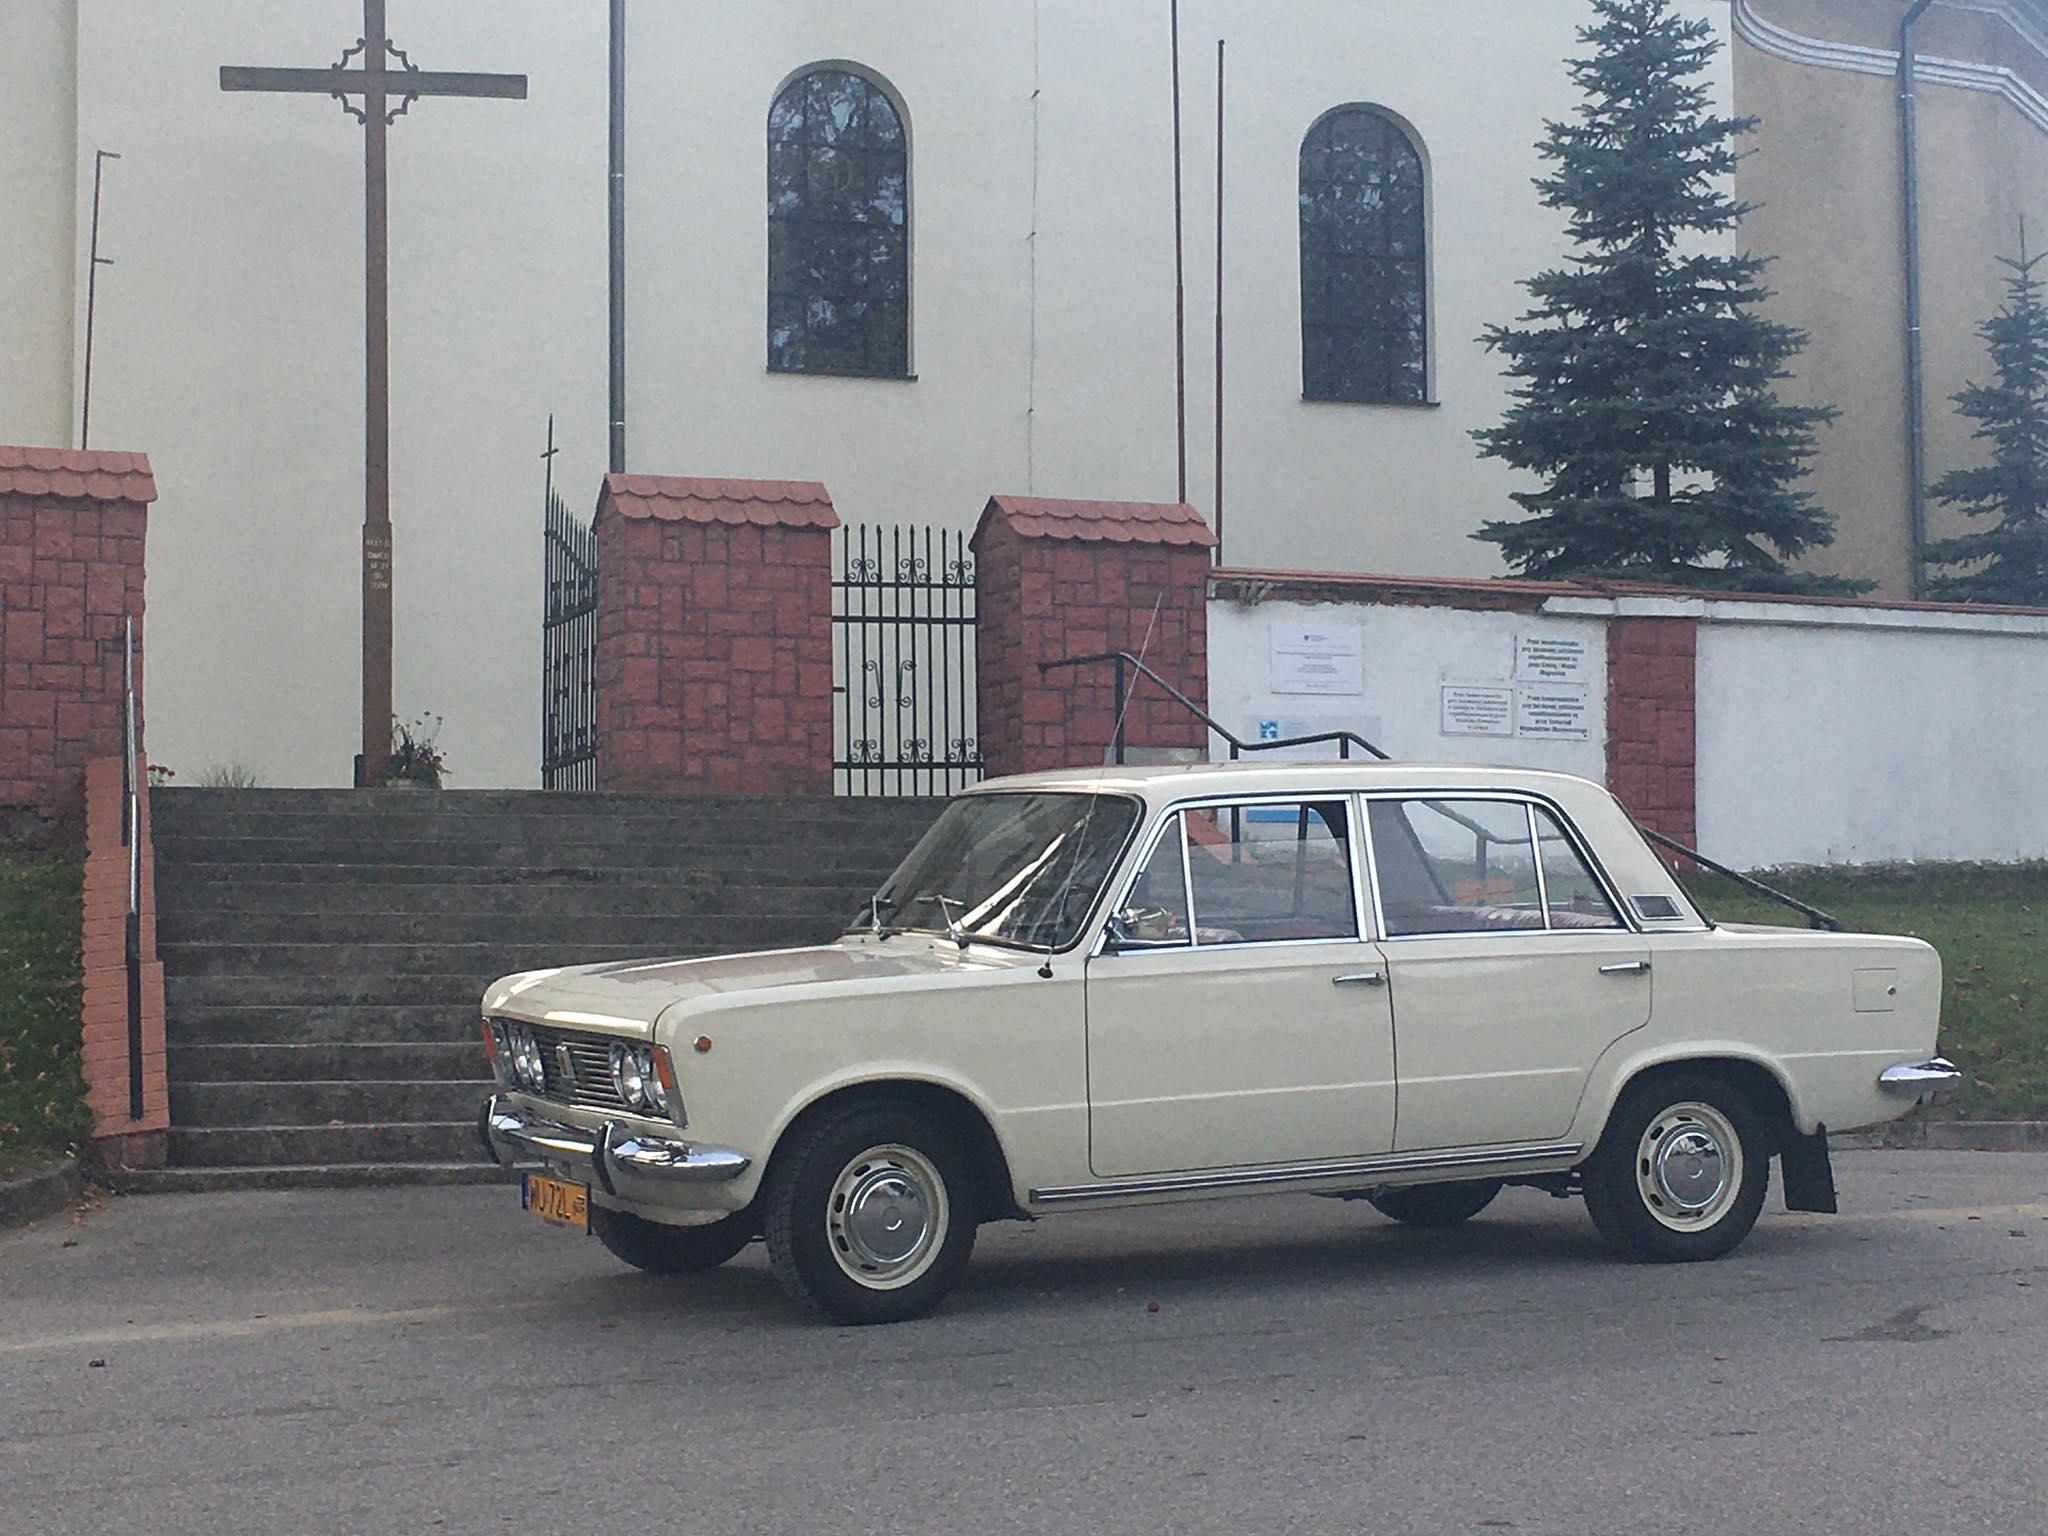 Fiat_125p_do_slubu_2019_09_2